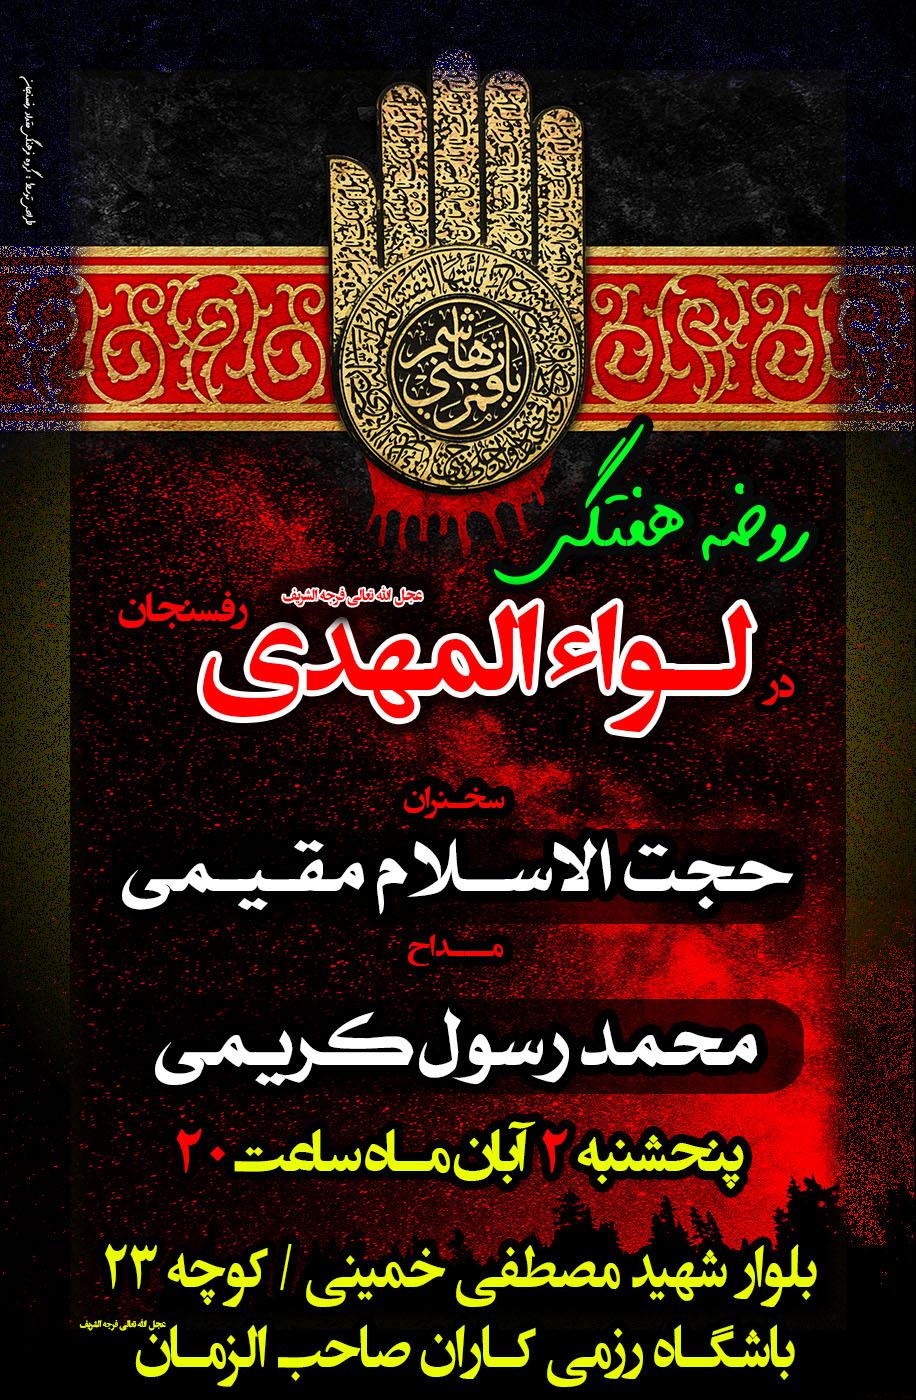 اعلام مراسم پنجشنبه 3 آبان ماه 1398